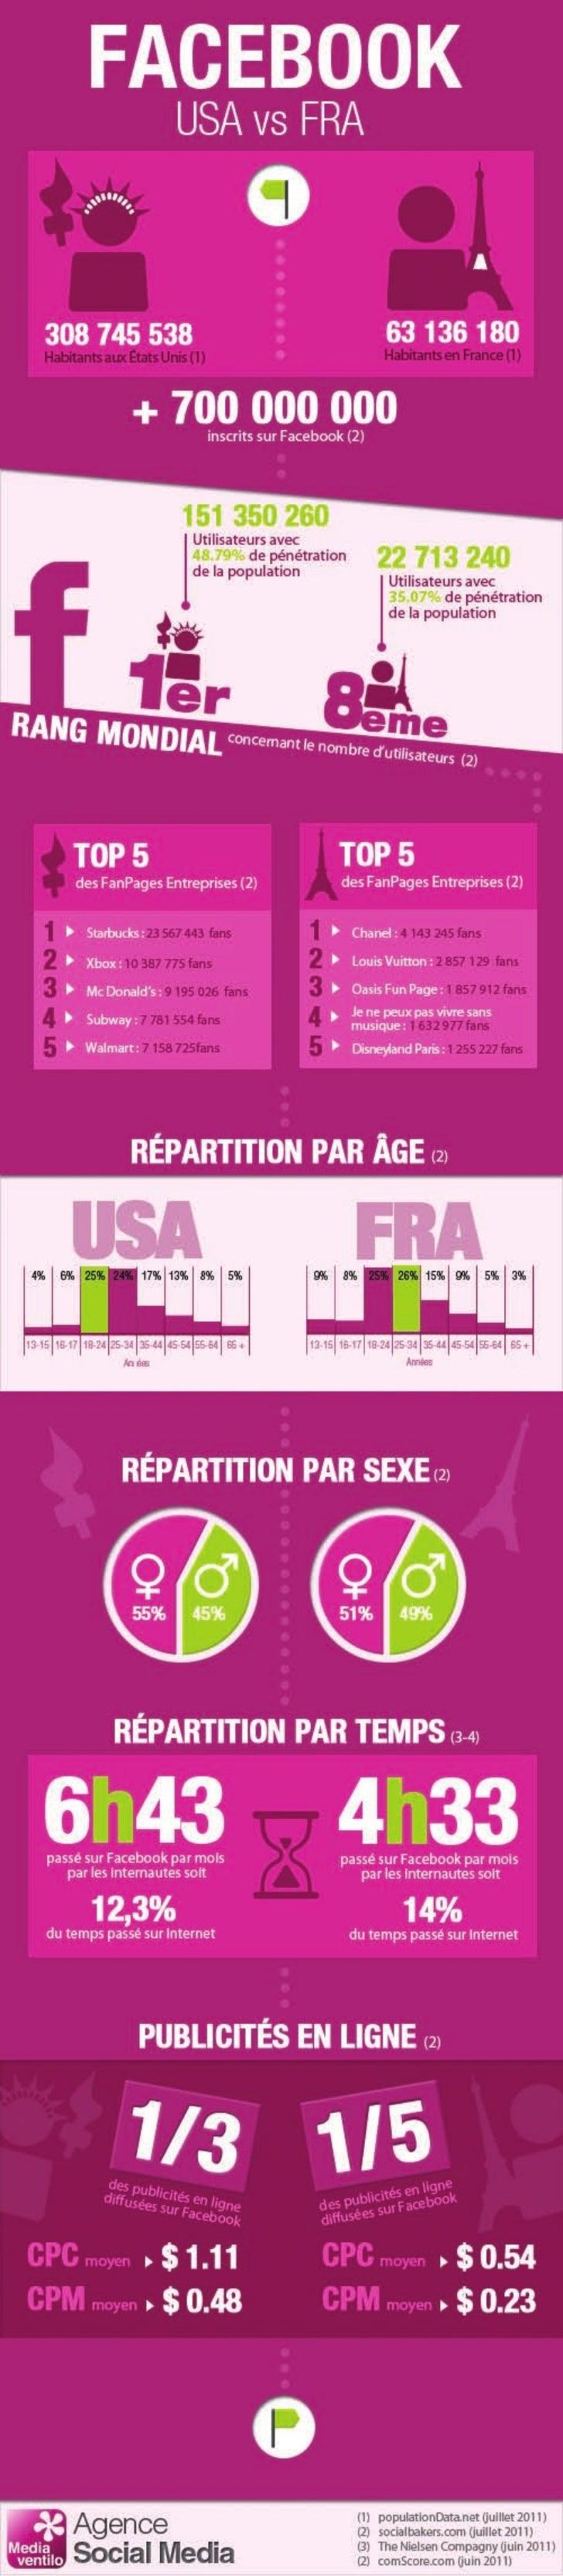 Facebook usa-vs-france